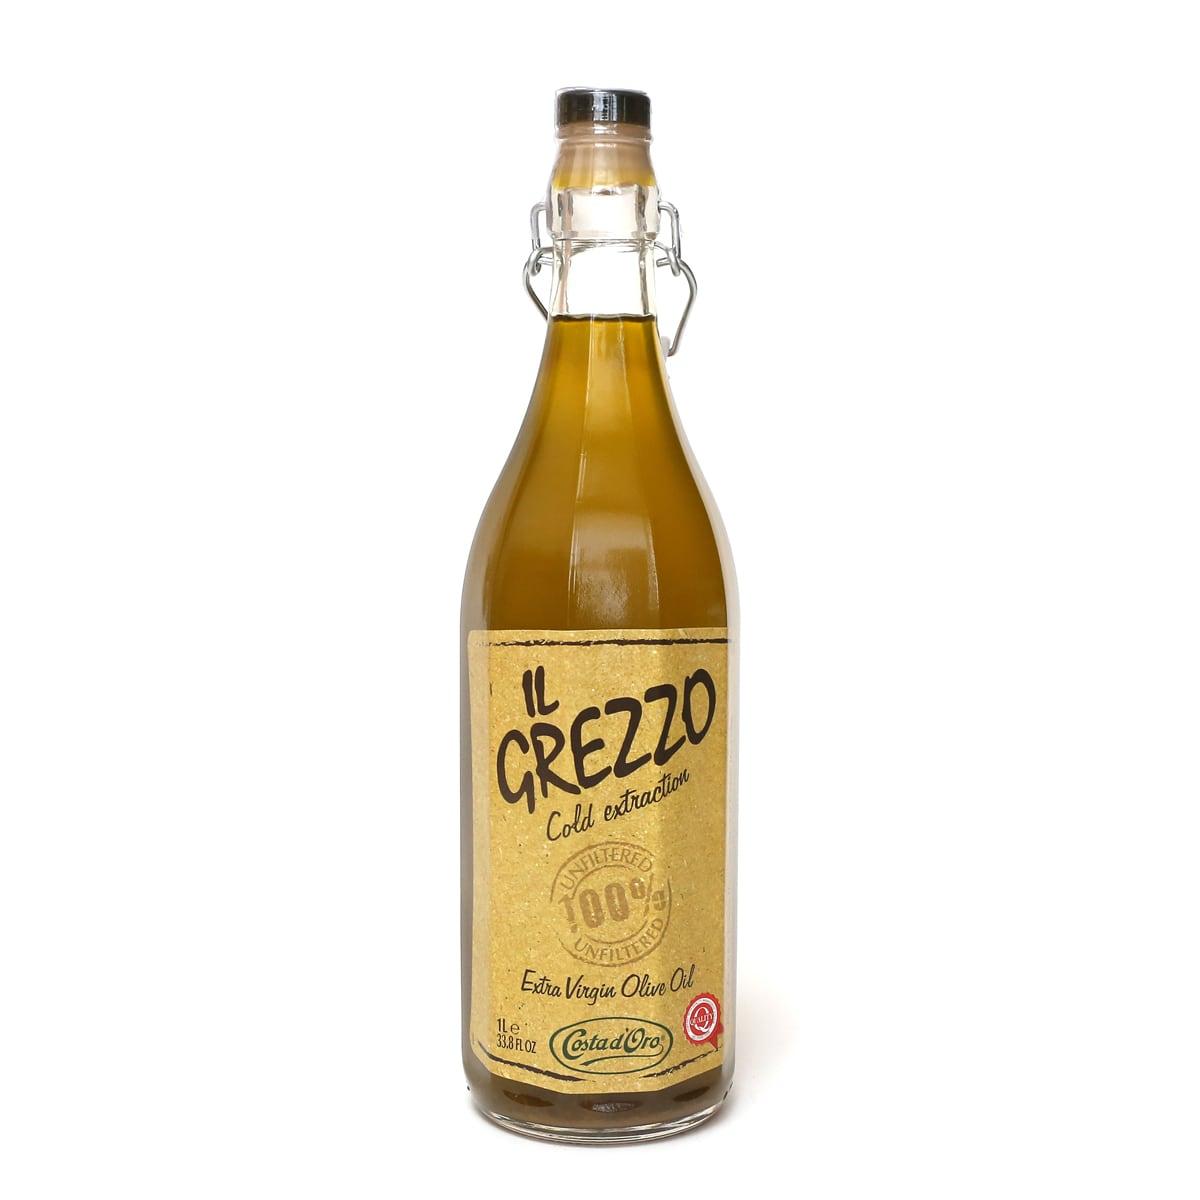 IL GREZZO(イル・グレッツォ) エキストラバージンオリーブオイル 913g×1本